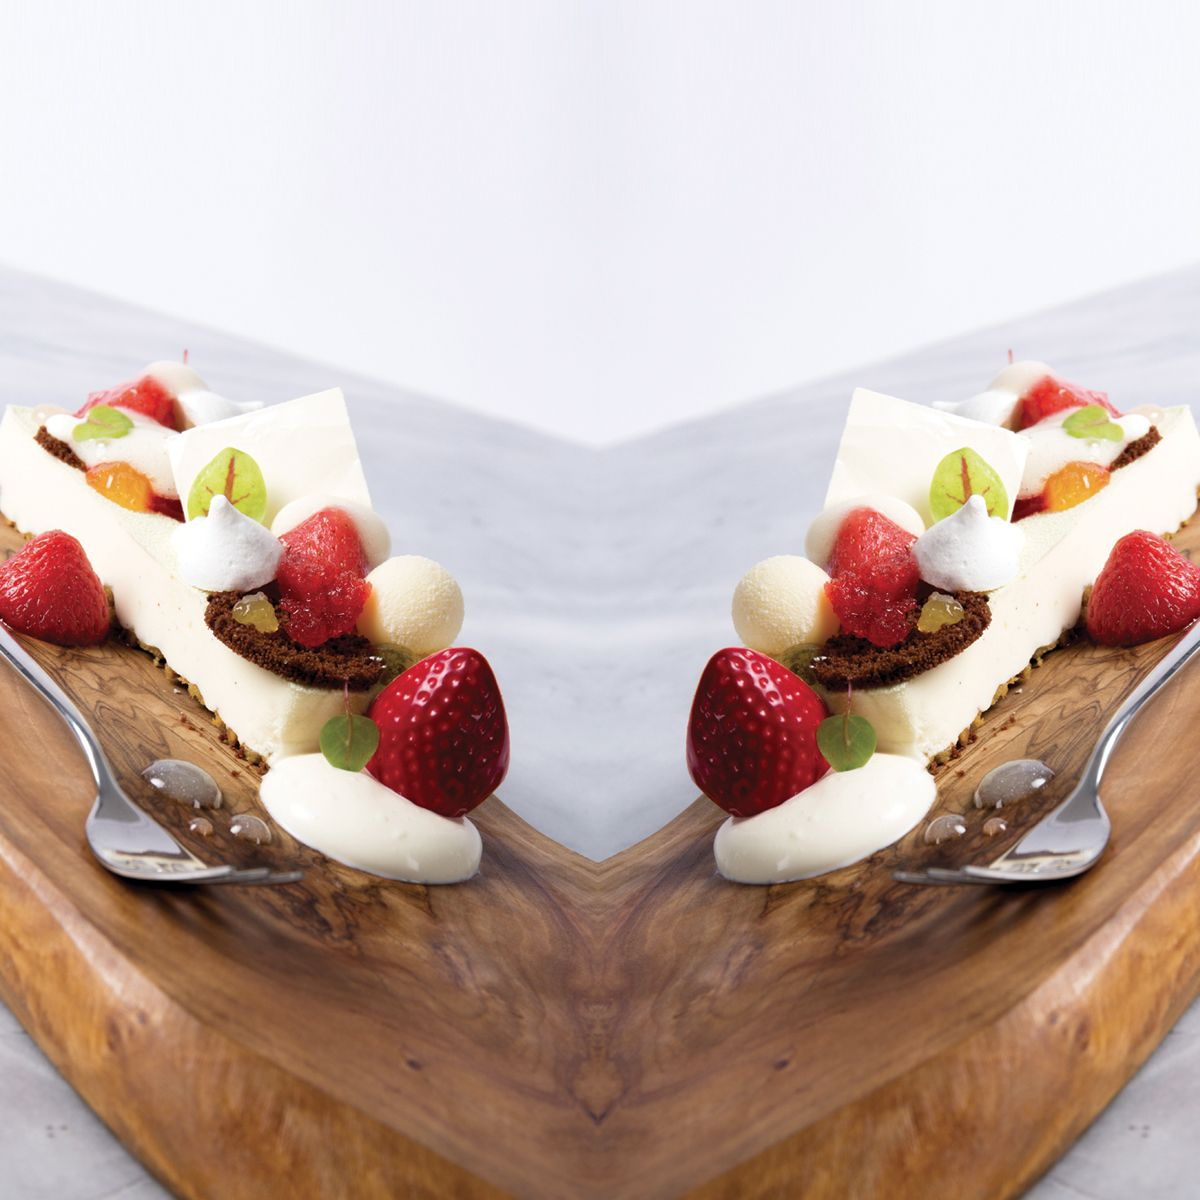 Https Www Alicedelice Com Decor Chocolat Blanc 5 Demifraises